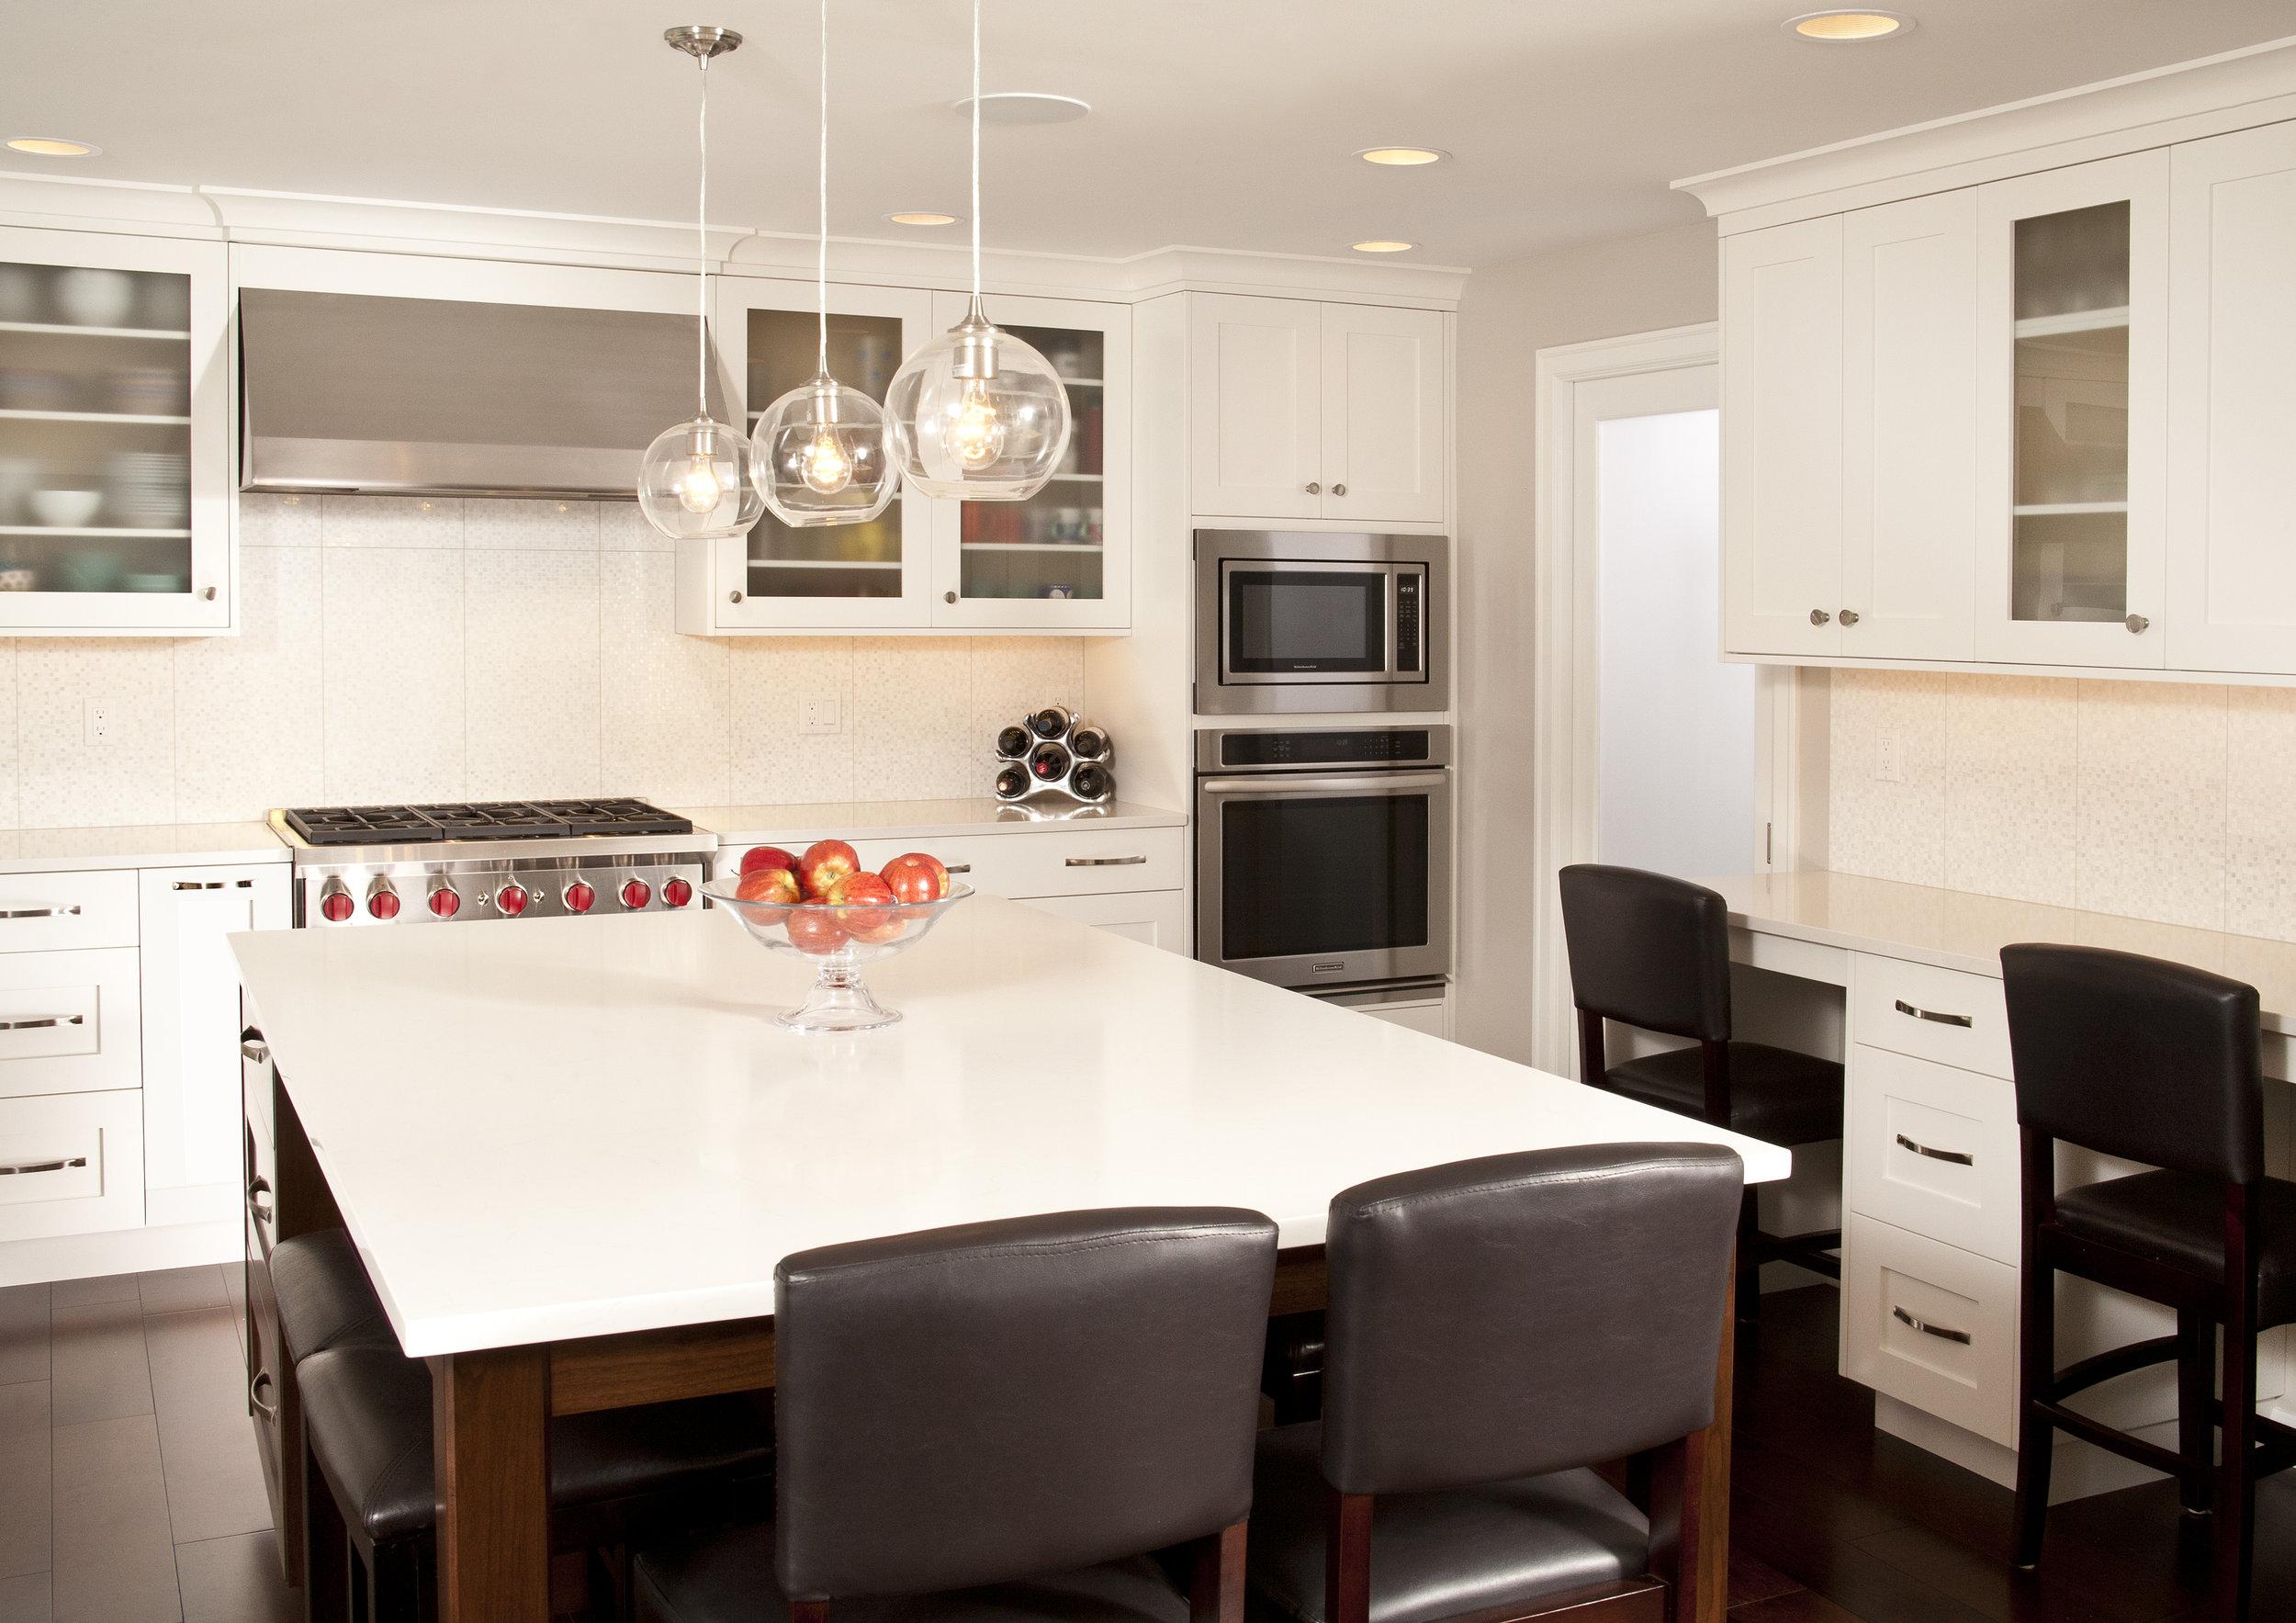 Bellevue Newport Shores Transitional Kitchen 4.jpg